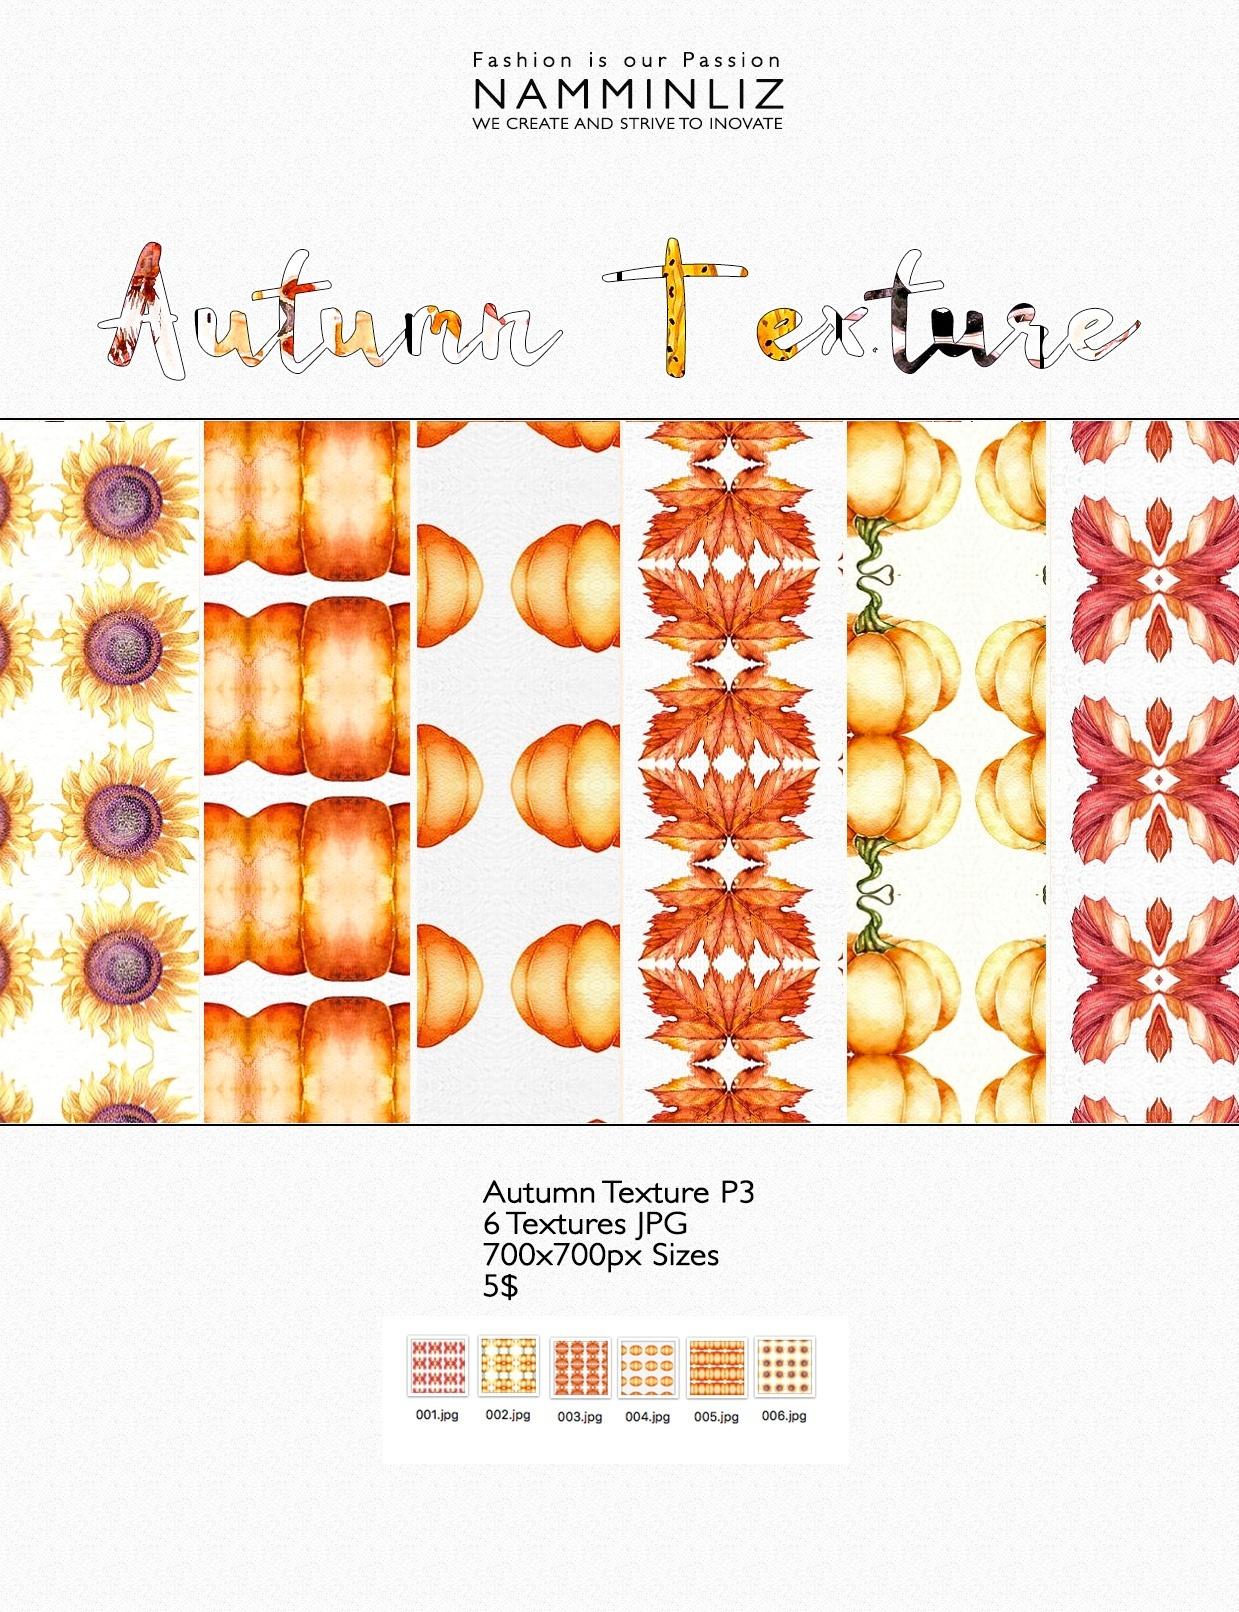 Autumn Texture P3 -  6 Textures JPG 700x700px